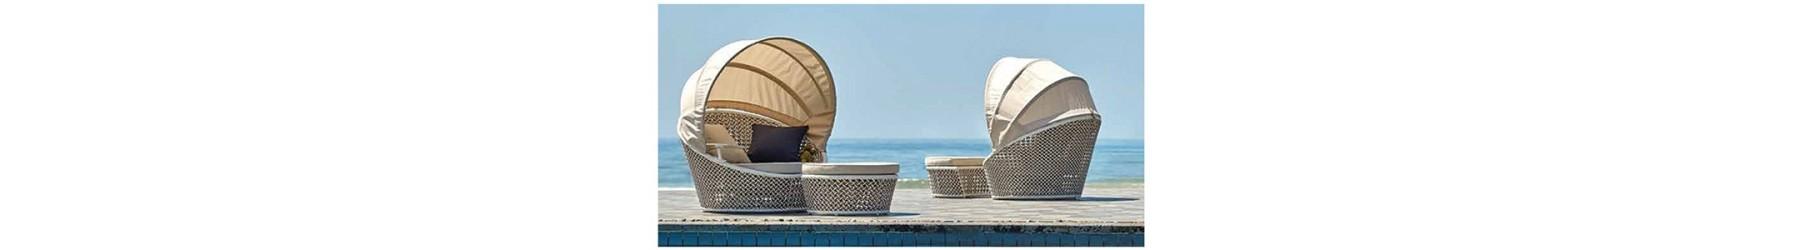 Daybed Καναπέδες για χρήση σε εξωτερικούς χώρους